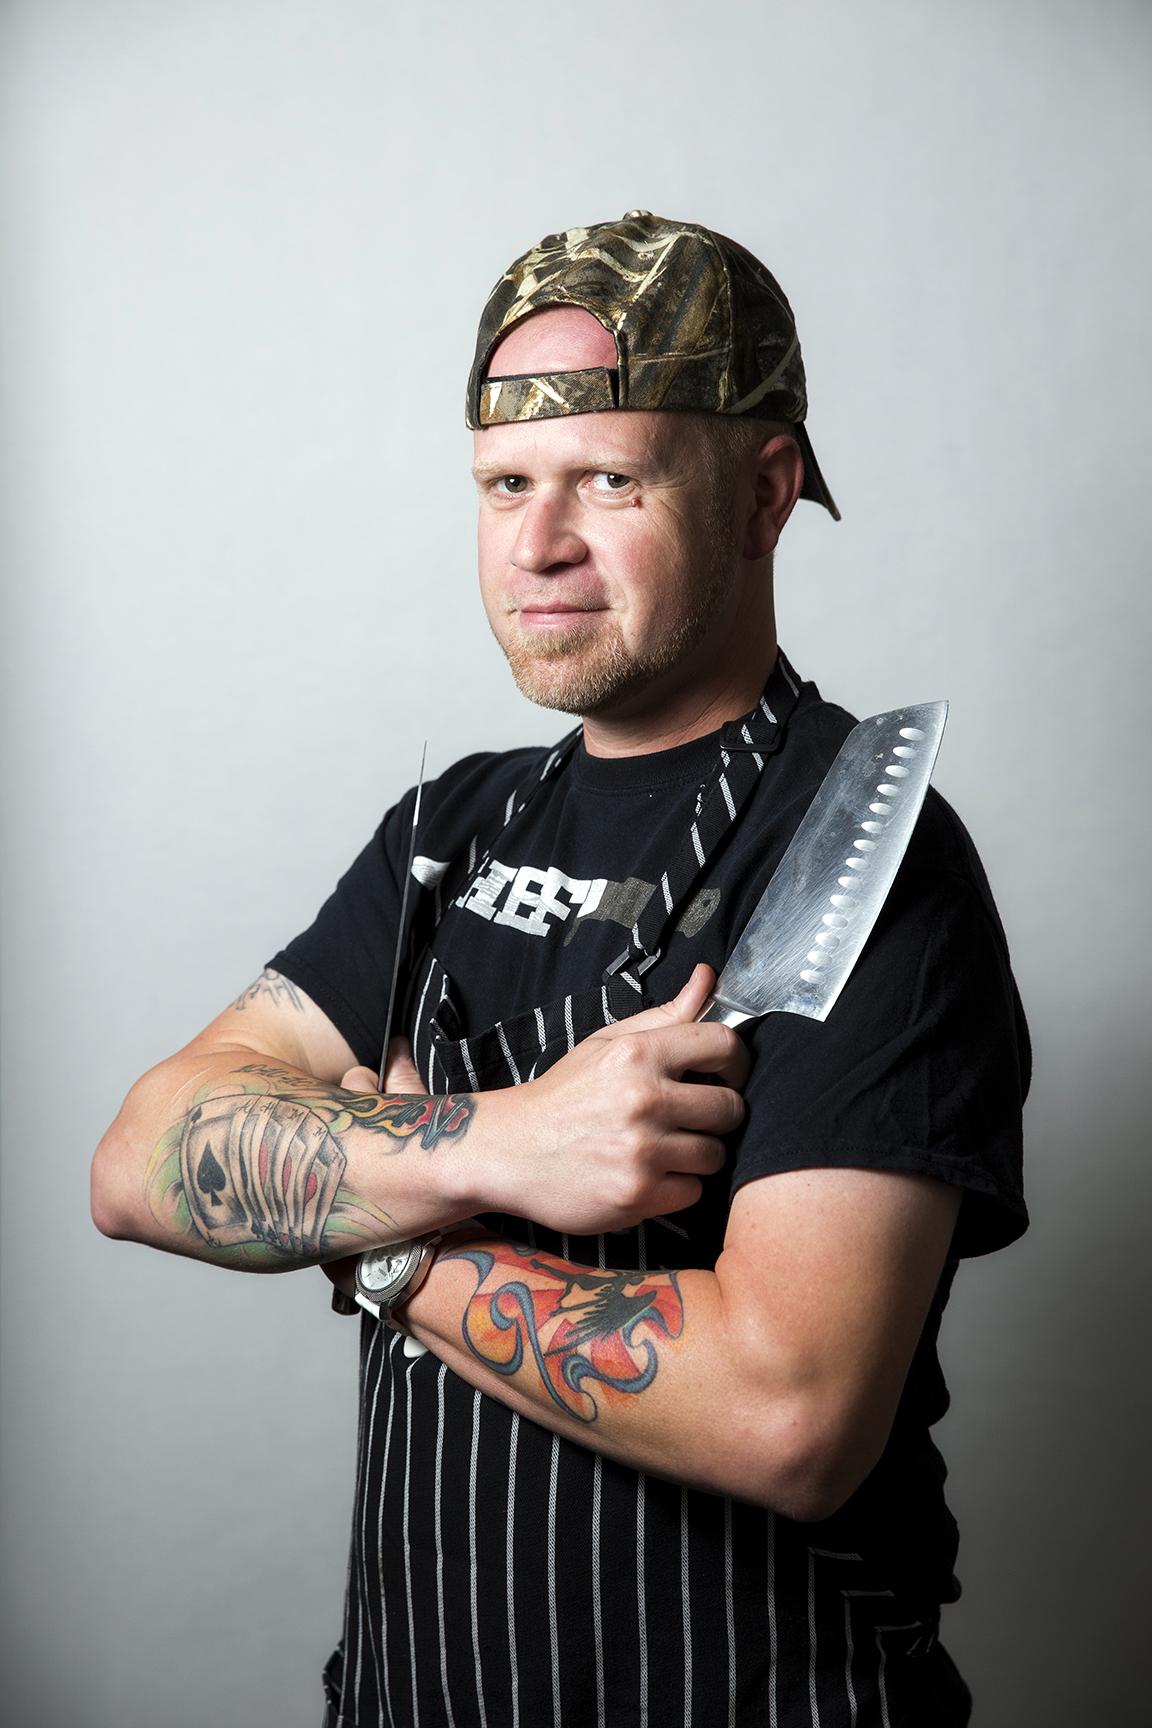 chef tattoos baton tattoo chris wadsworth rouge culture food feel 225batonrouge